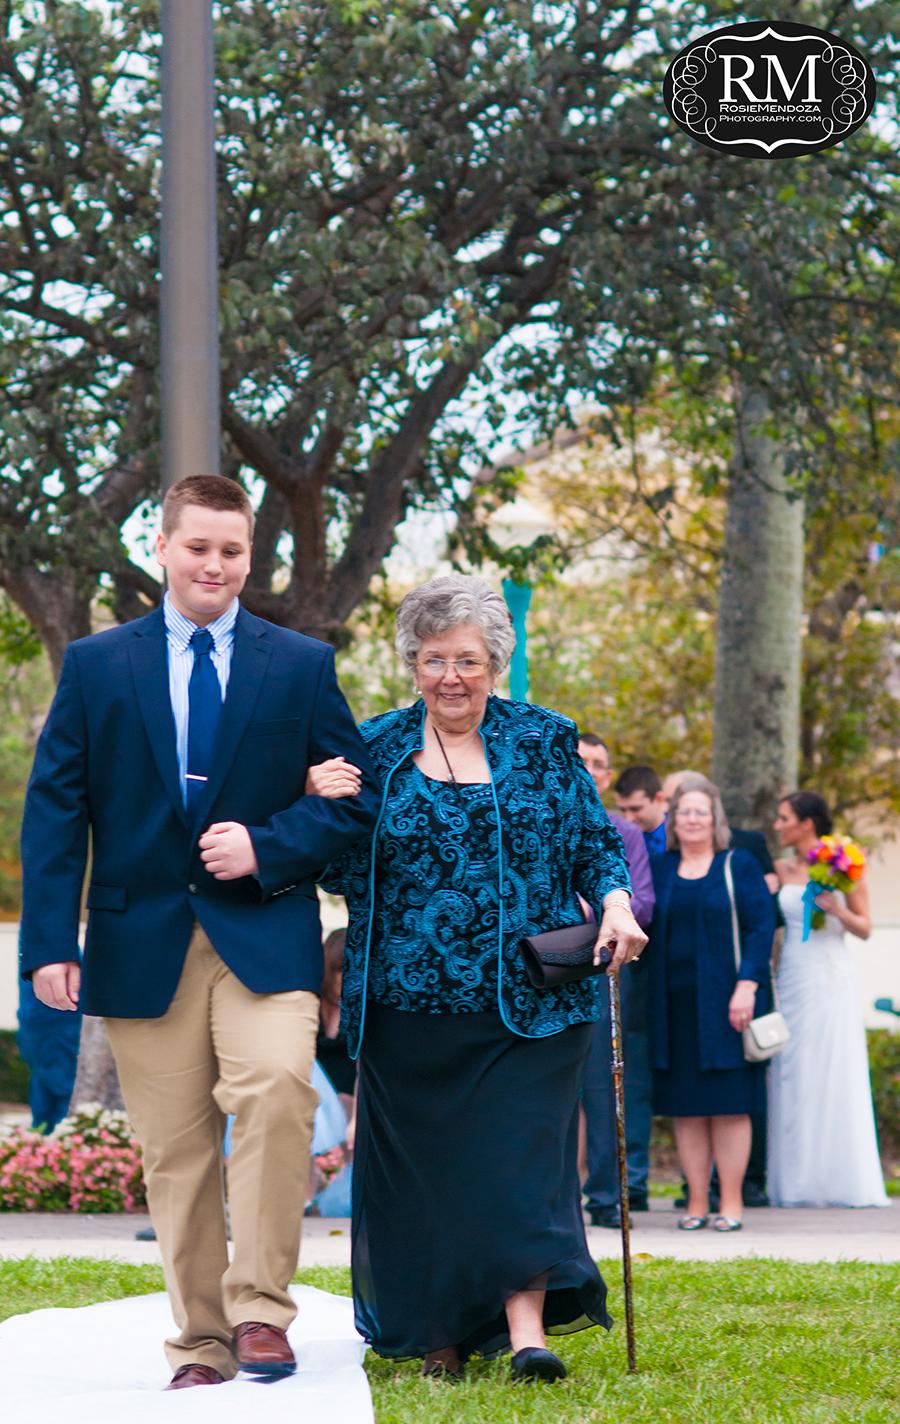 Veterans-Park-Gazebo-Delray-Beach-Destination-wedding-walk-down-the-isle-photo